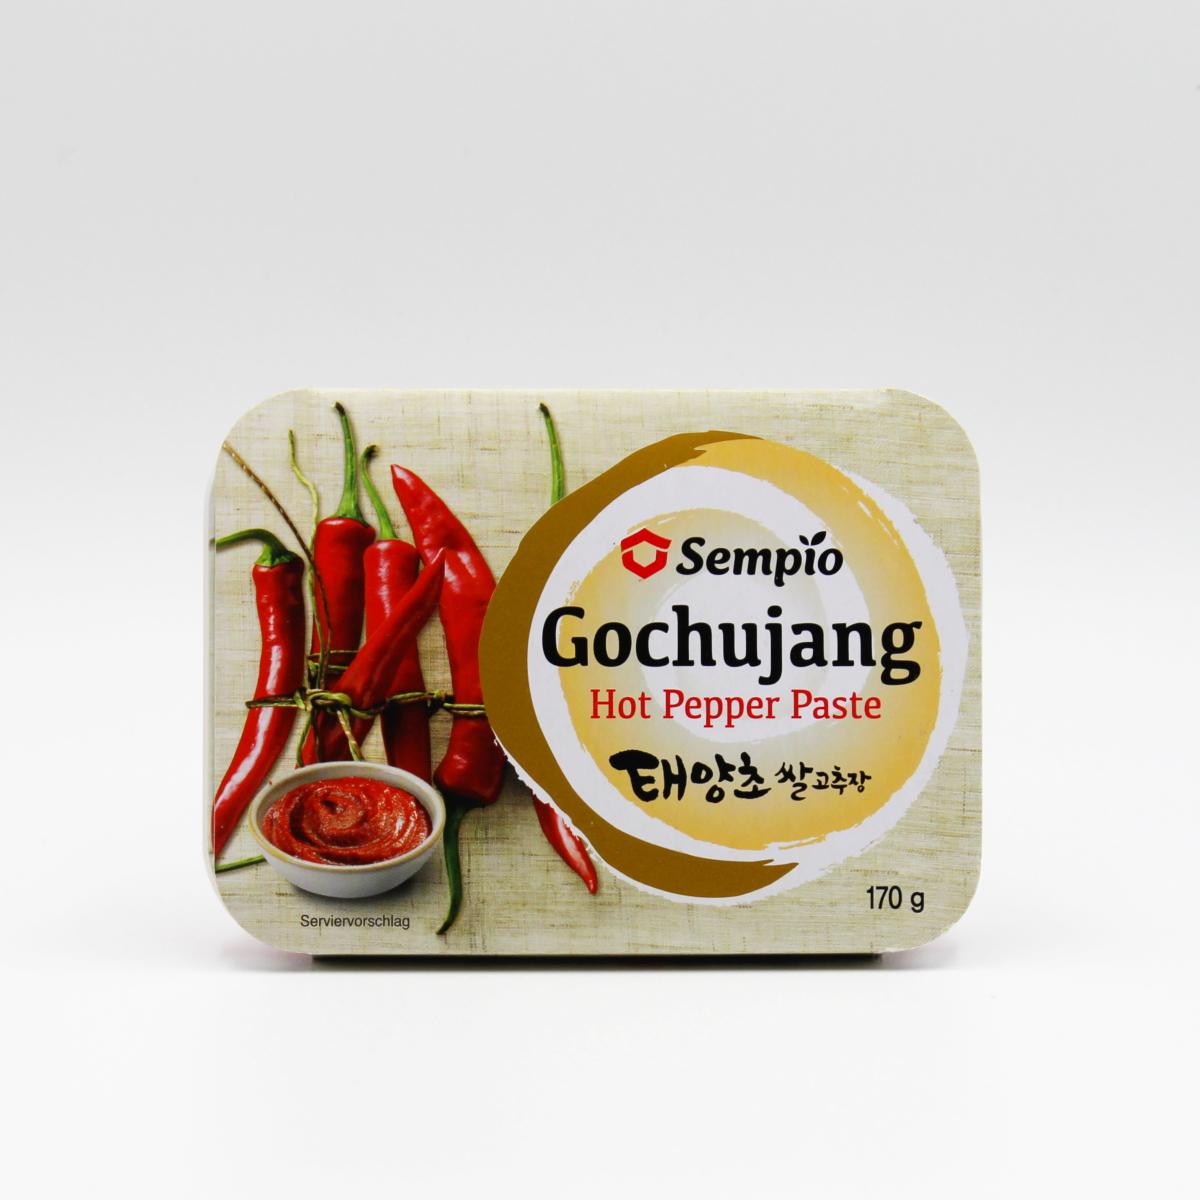 Gochujang 170g (scharfe Paprikapaste), SEMPIO